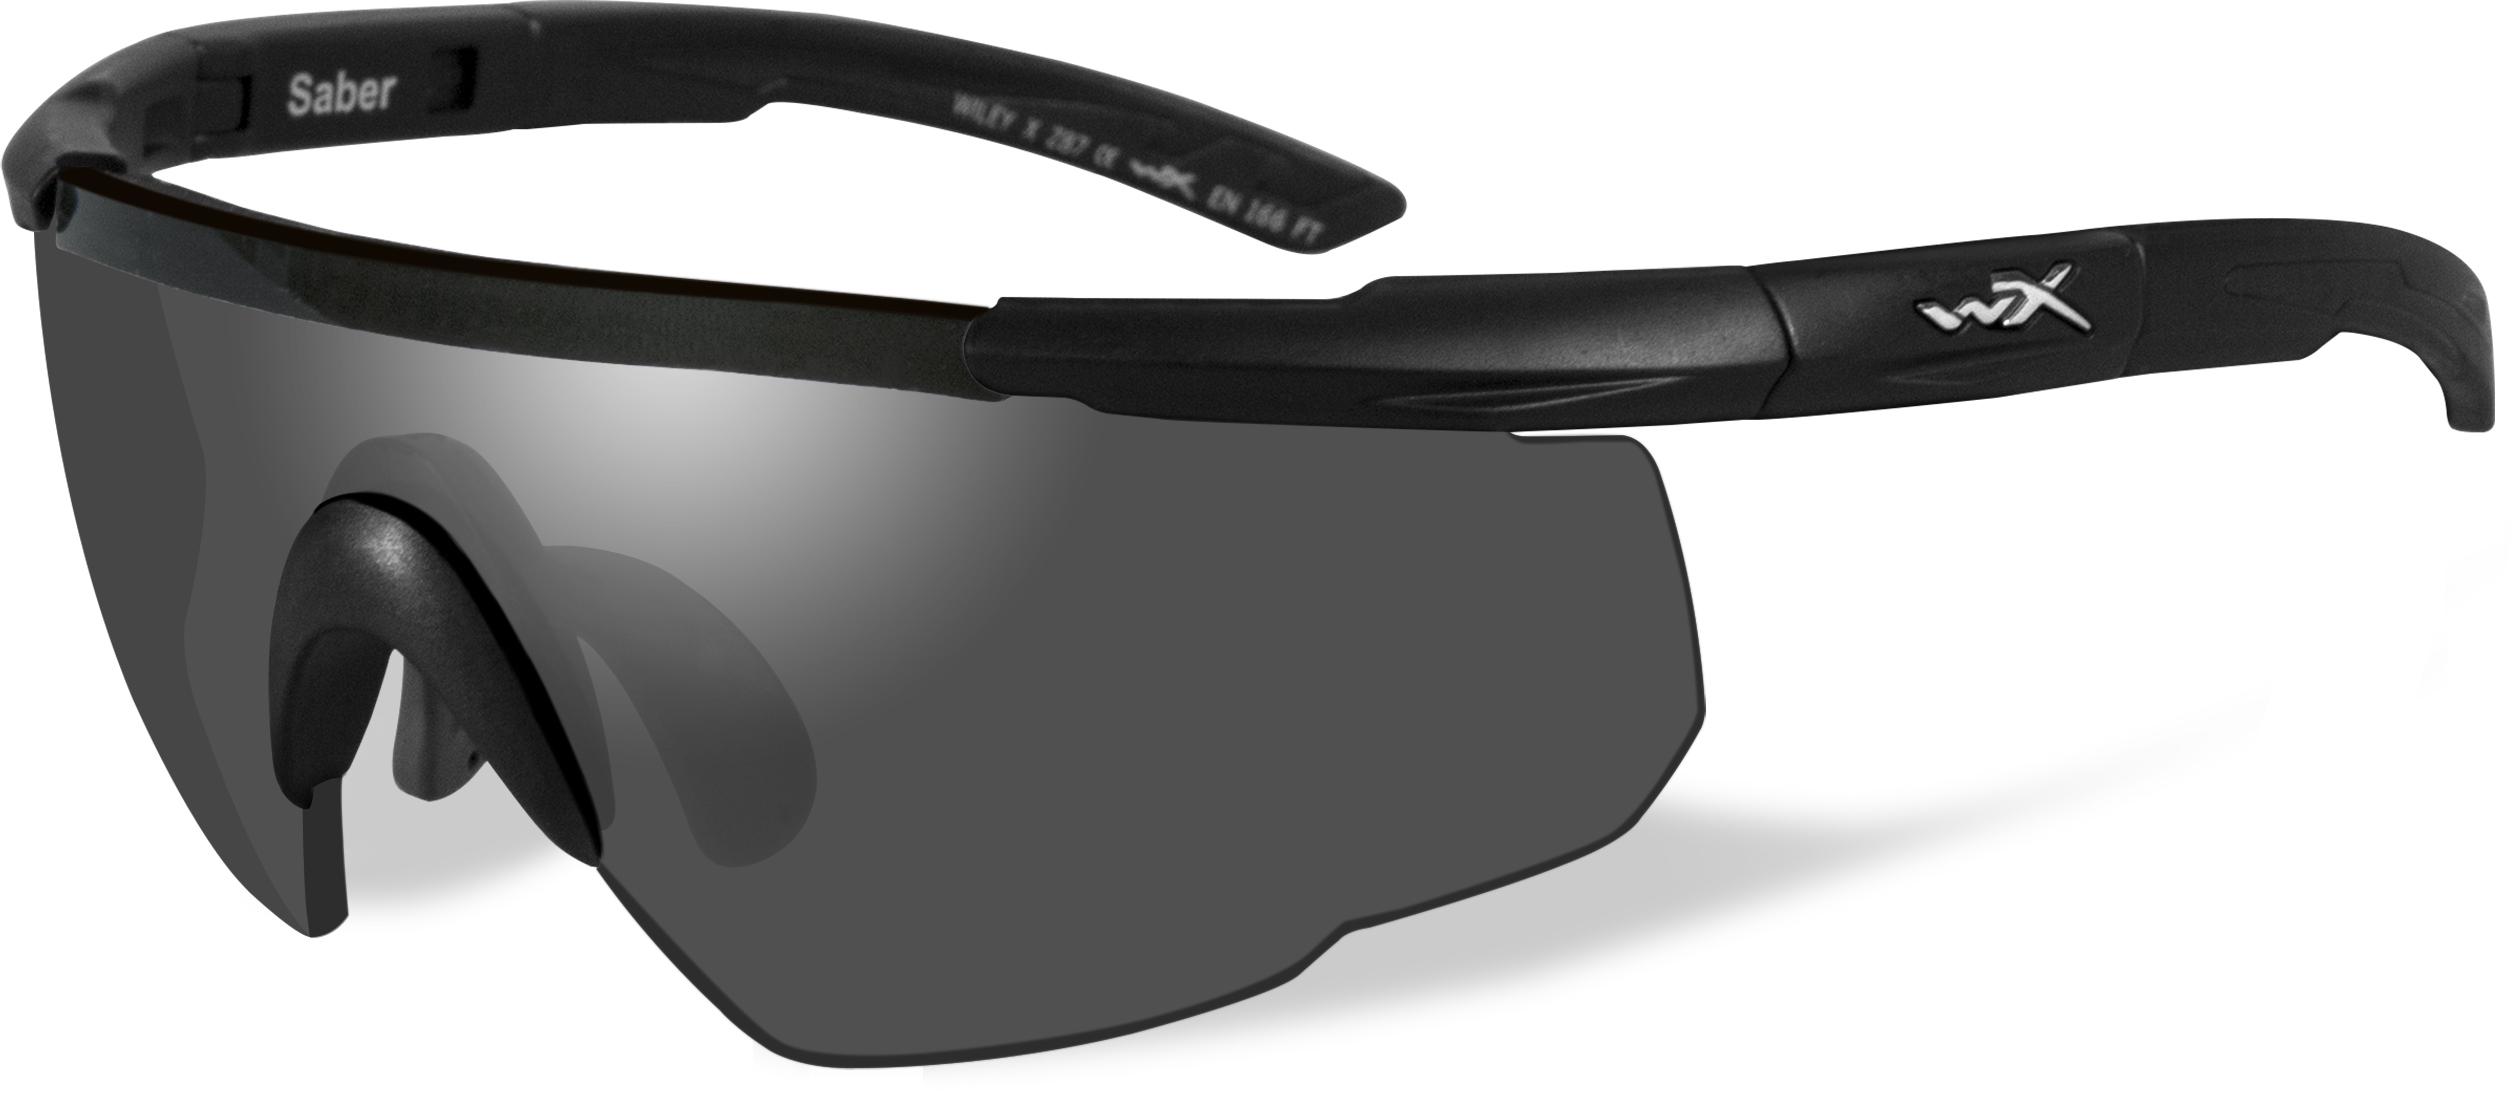 cbb9768ef1 Wiley X Saber Advanced Sunglasses 2-Lens Package - Matte Black w  Gray